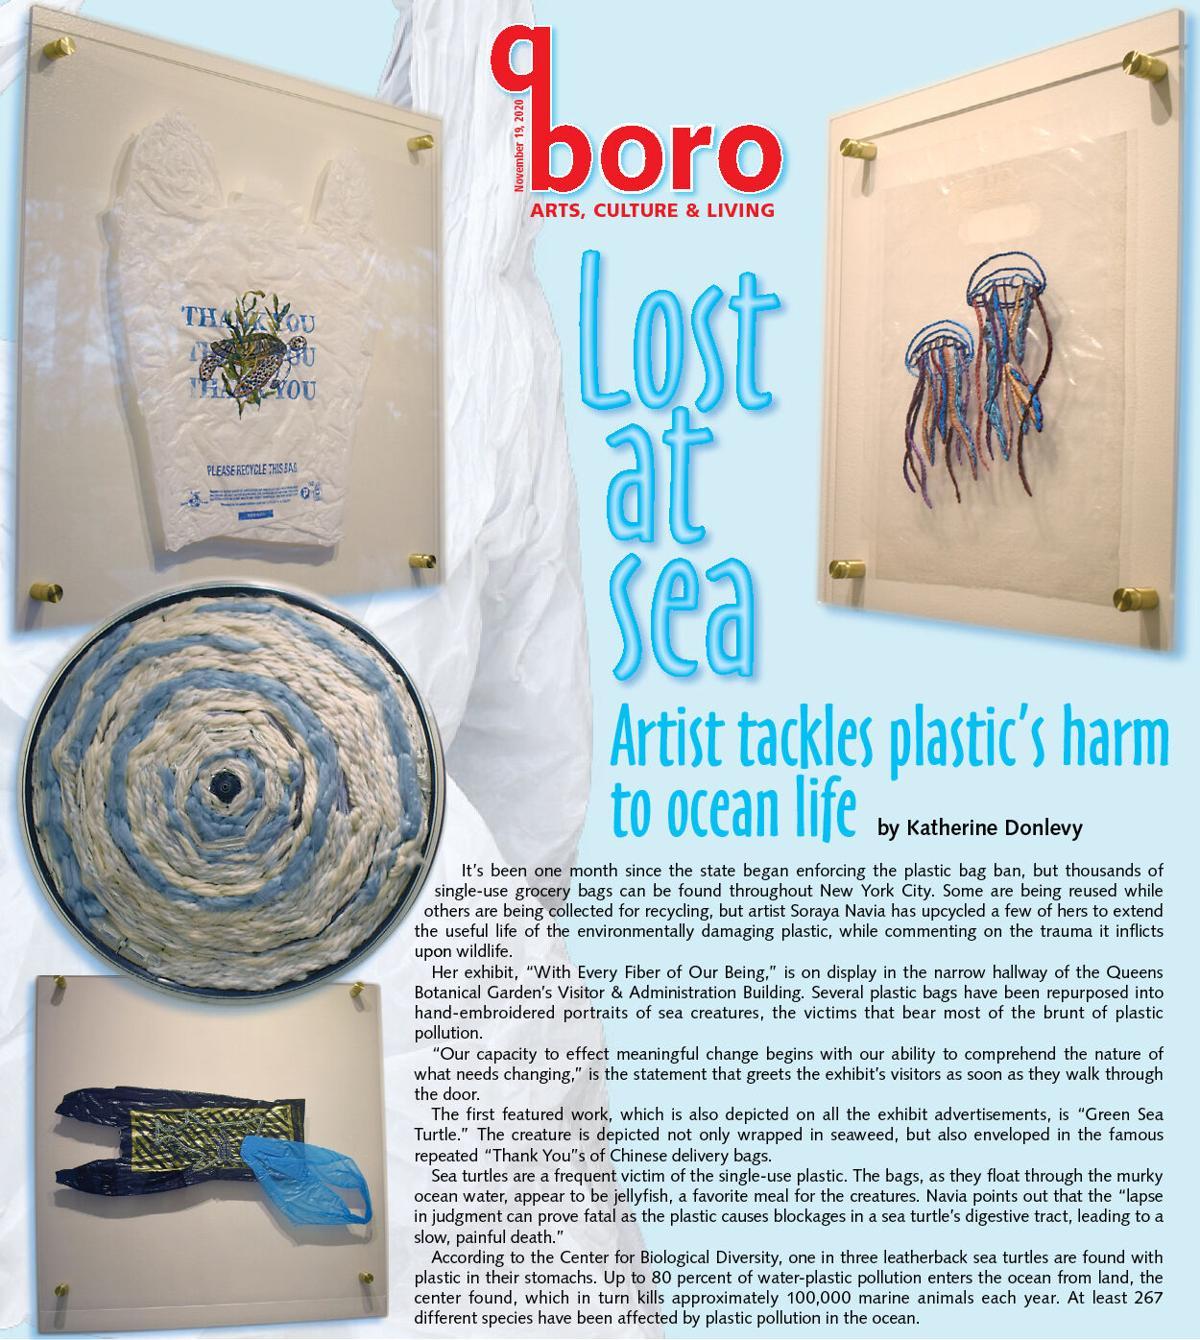 Reclaiming plastic on behalf of sea creatures 1